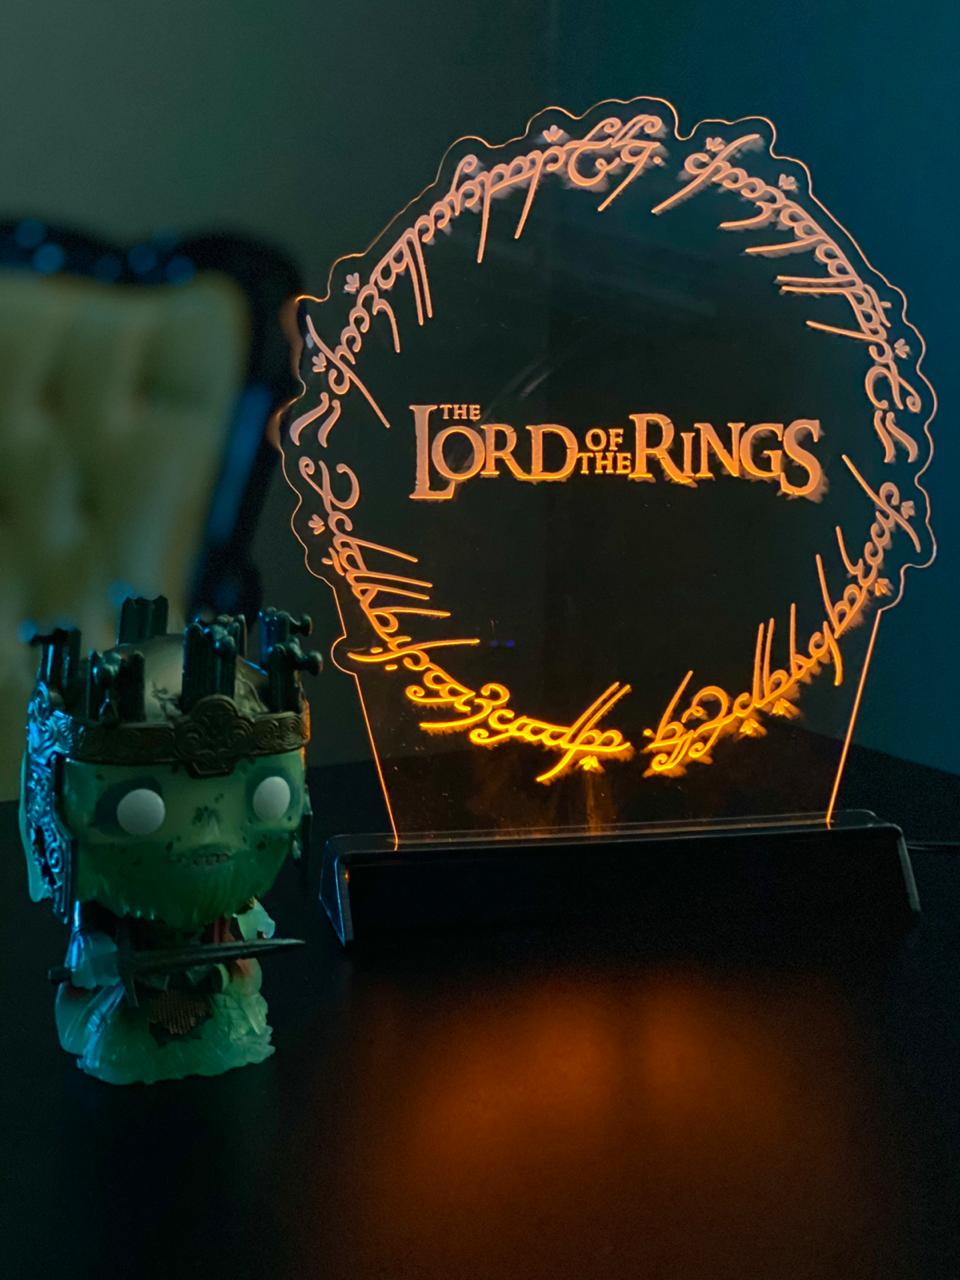 Luminária/Abajur: Senhor dos Aneis: The Lord Of The Rings